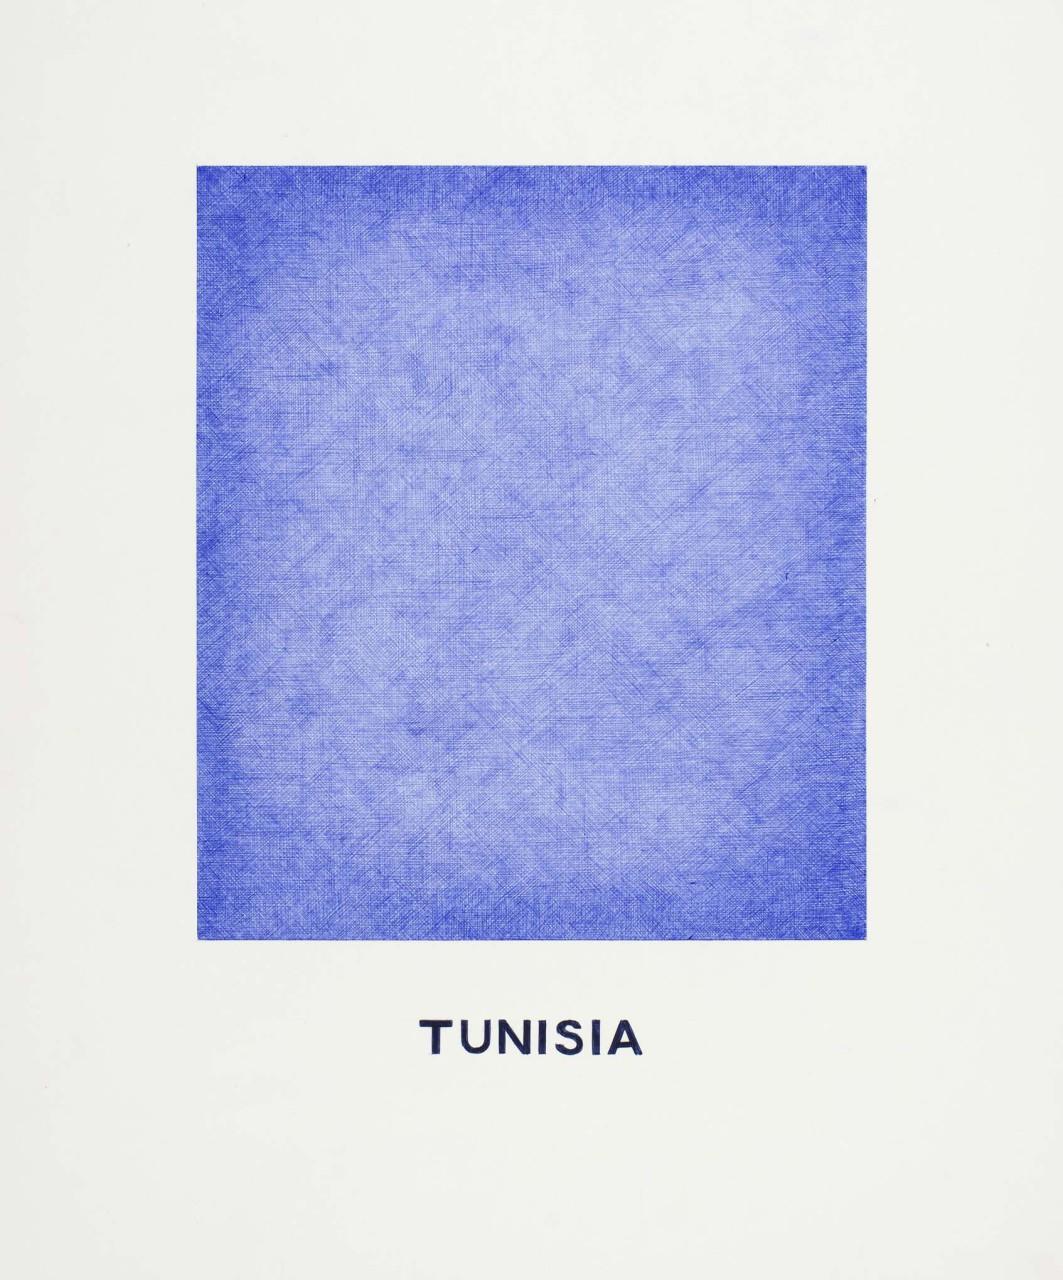 tunisia_bassa